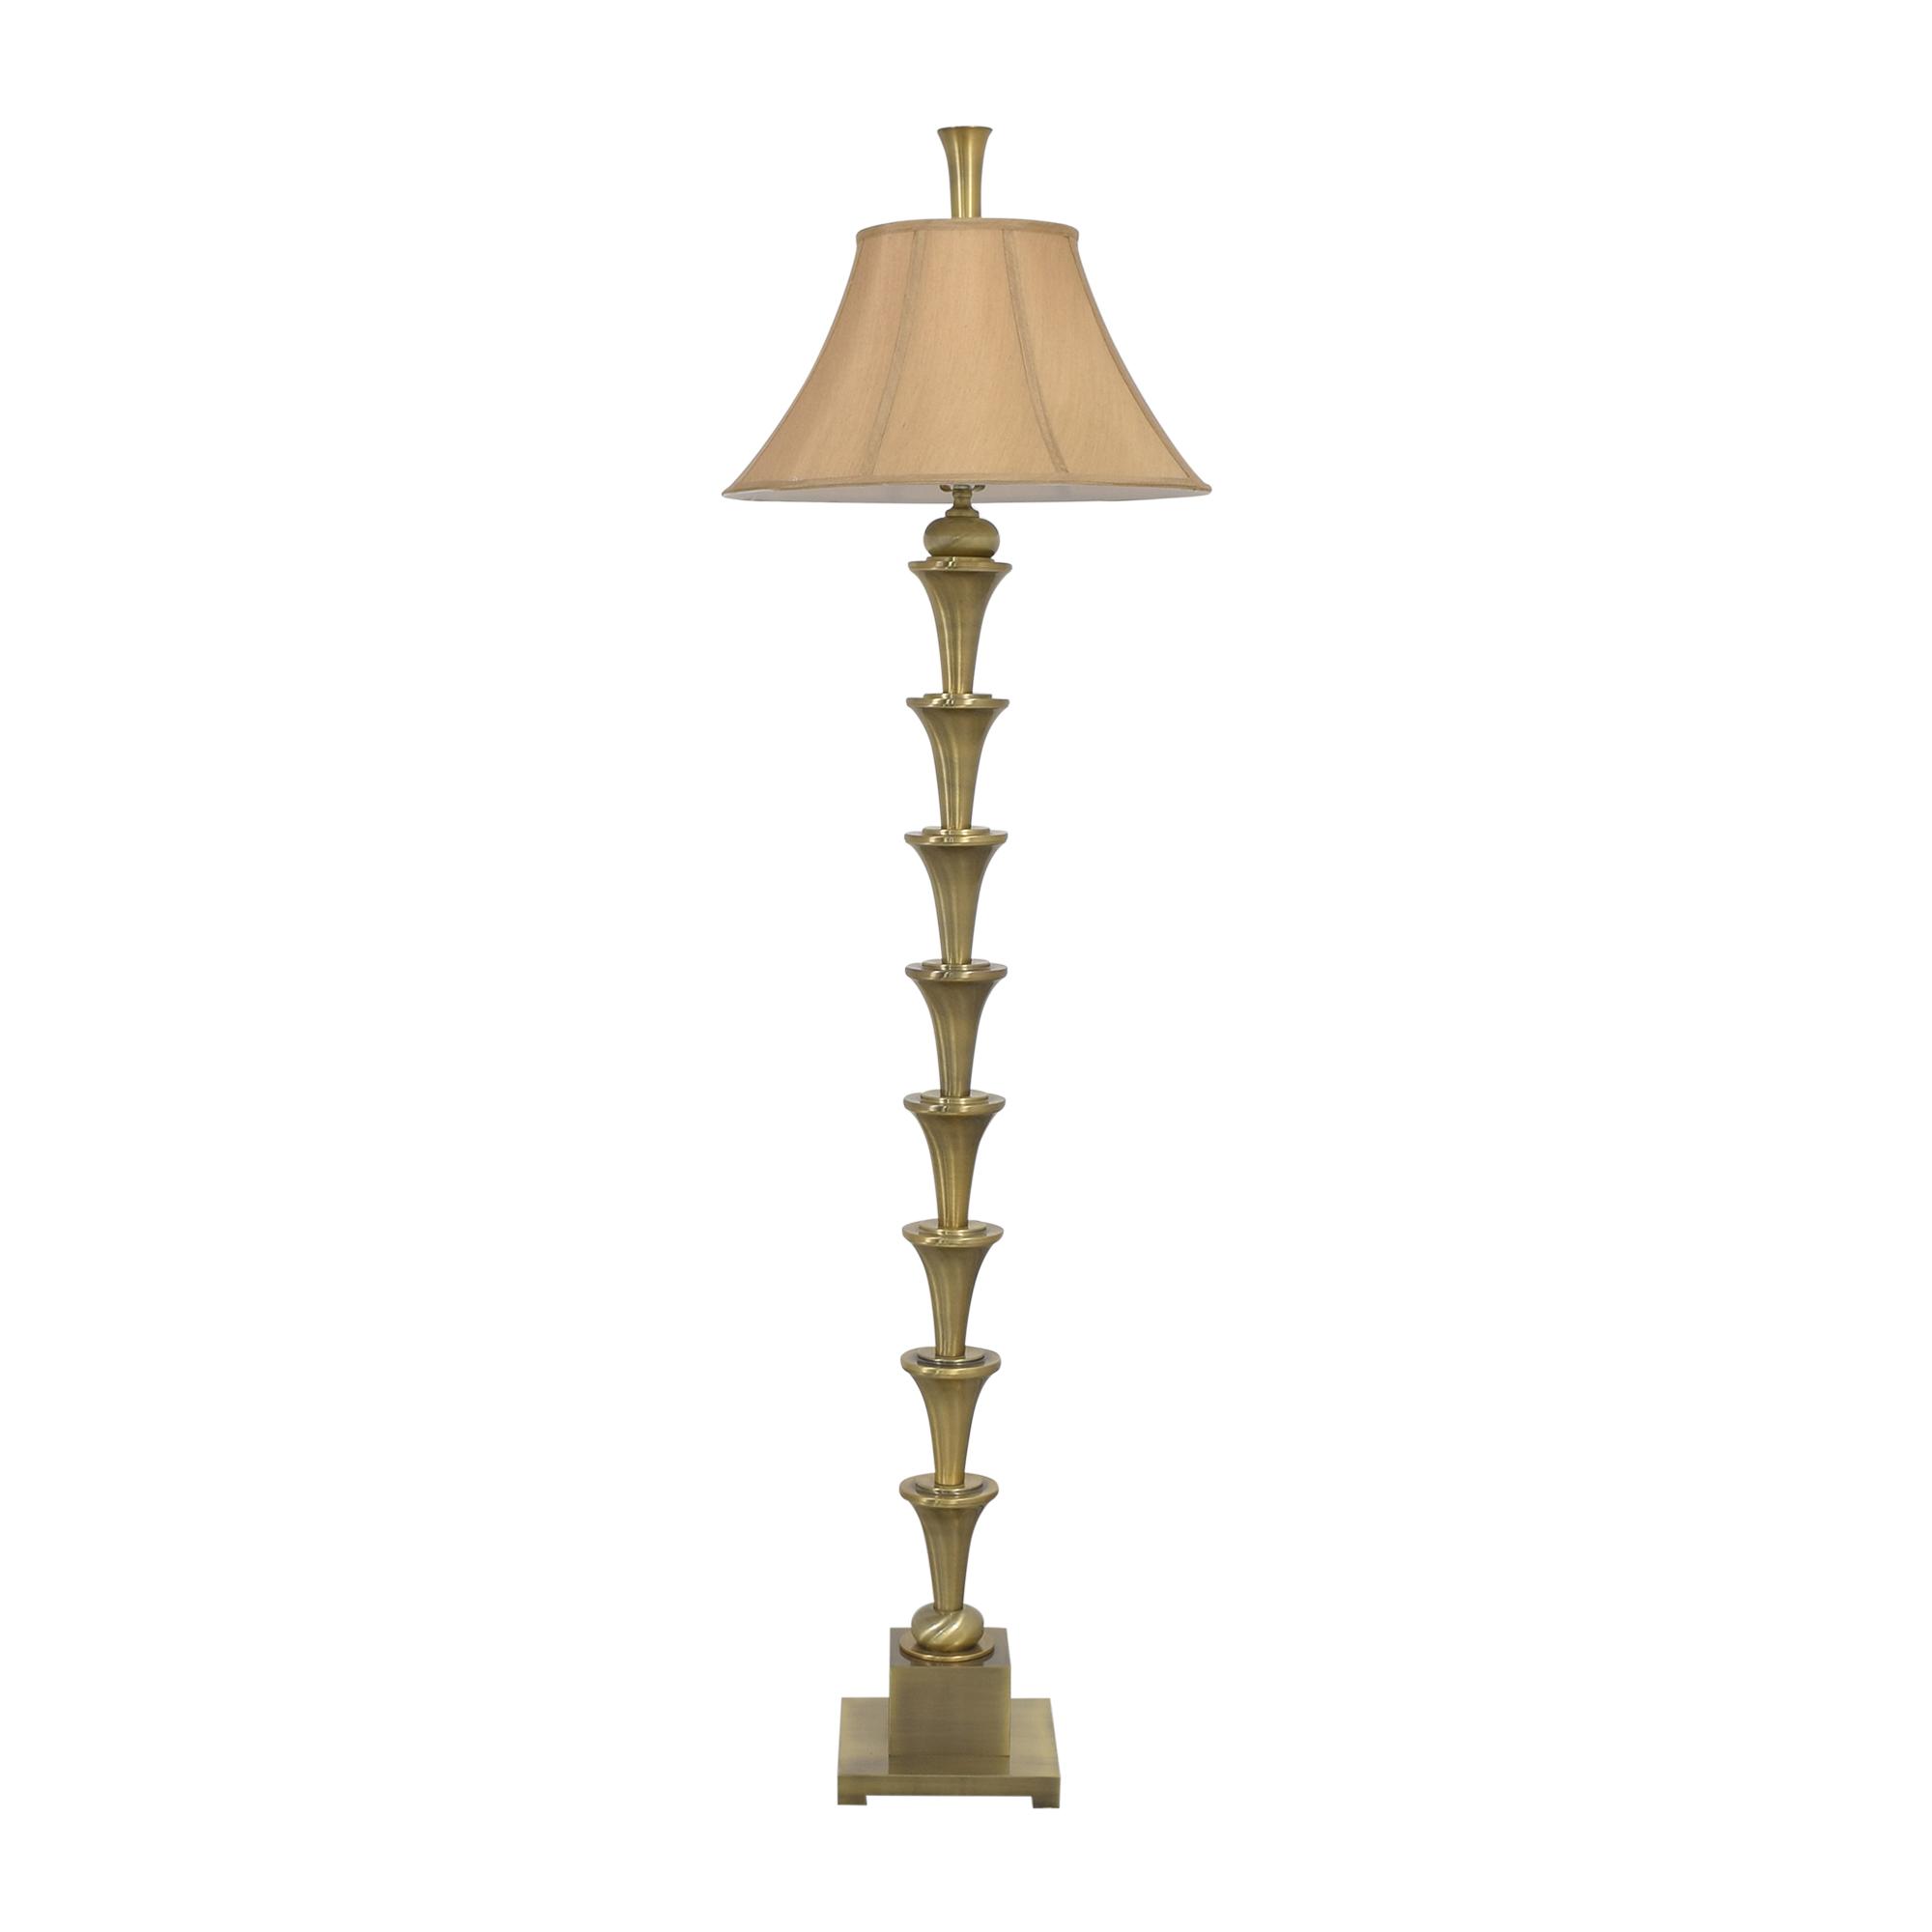 buy Horchow Horchow Decorative Floor Lamp online